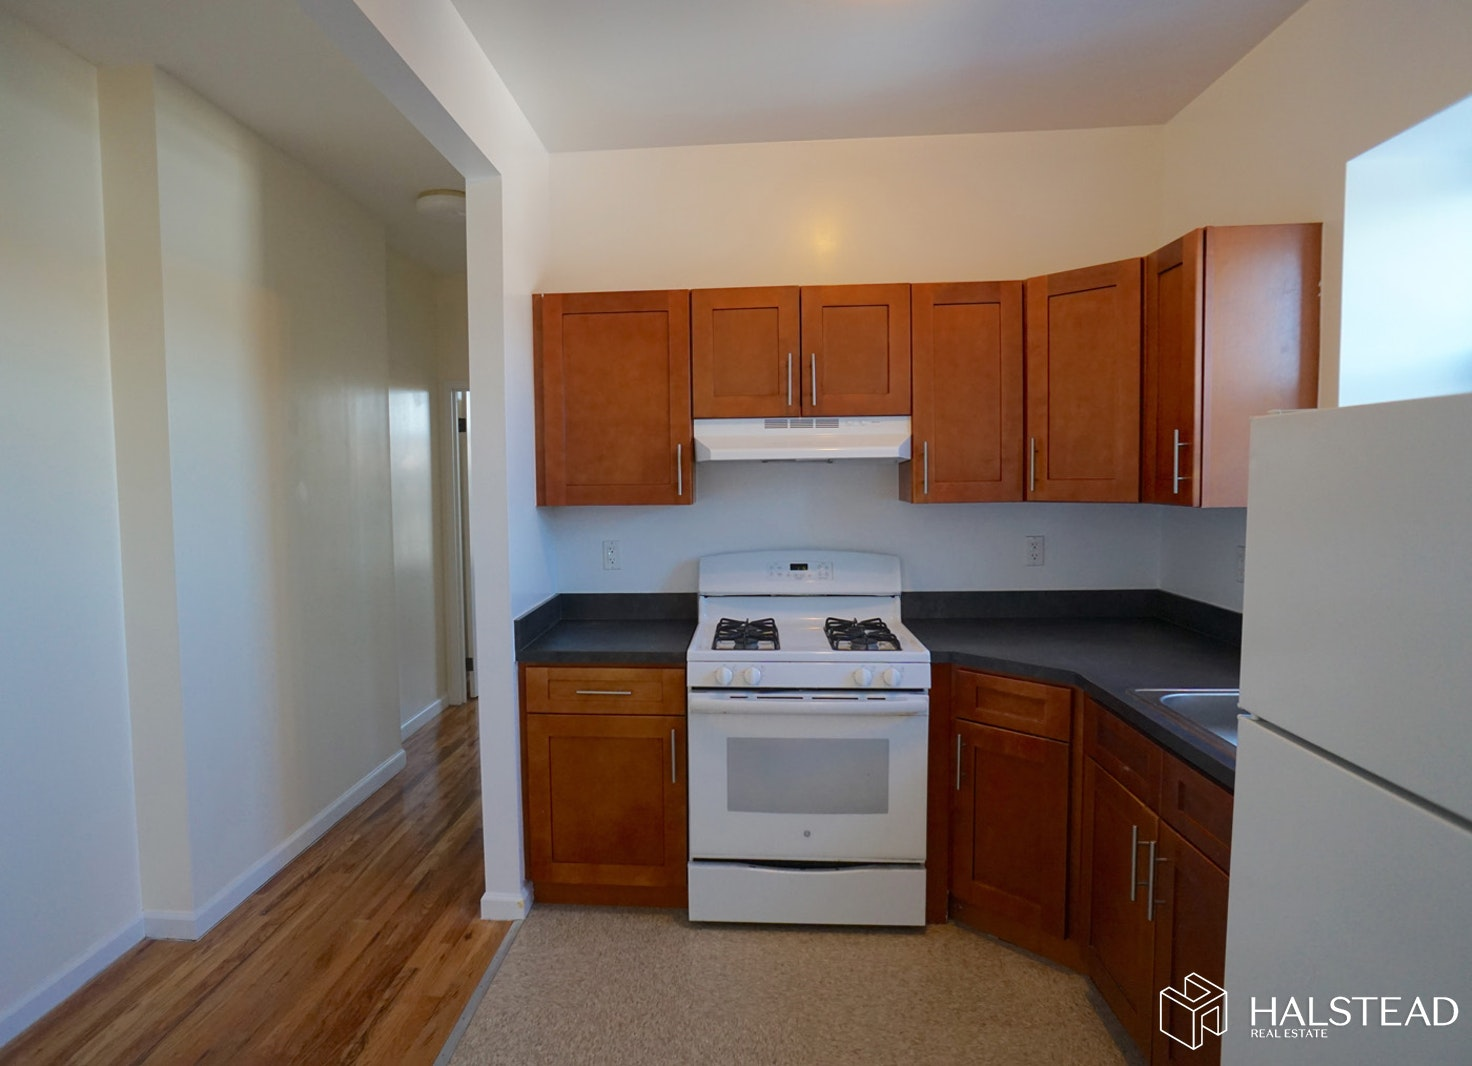 295A BAINBRIDGE STREET 4B, Bedford Stuyvesant, $1,200, Web #: 19979513